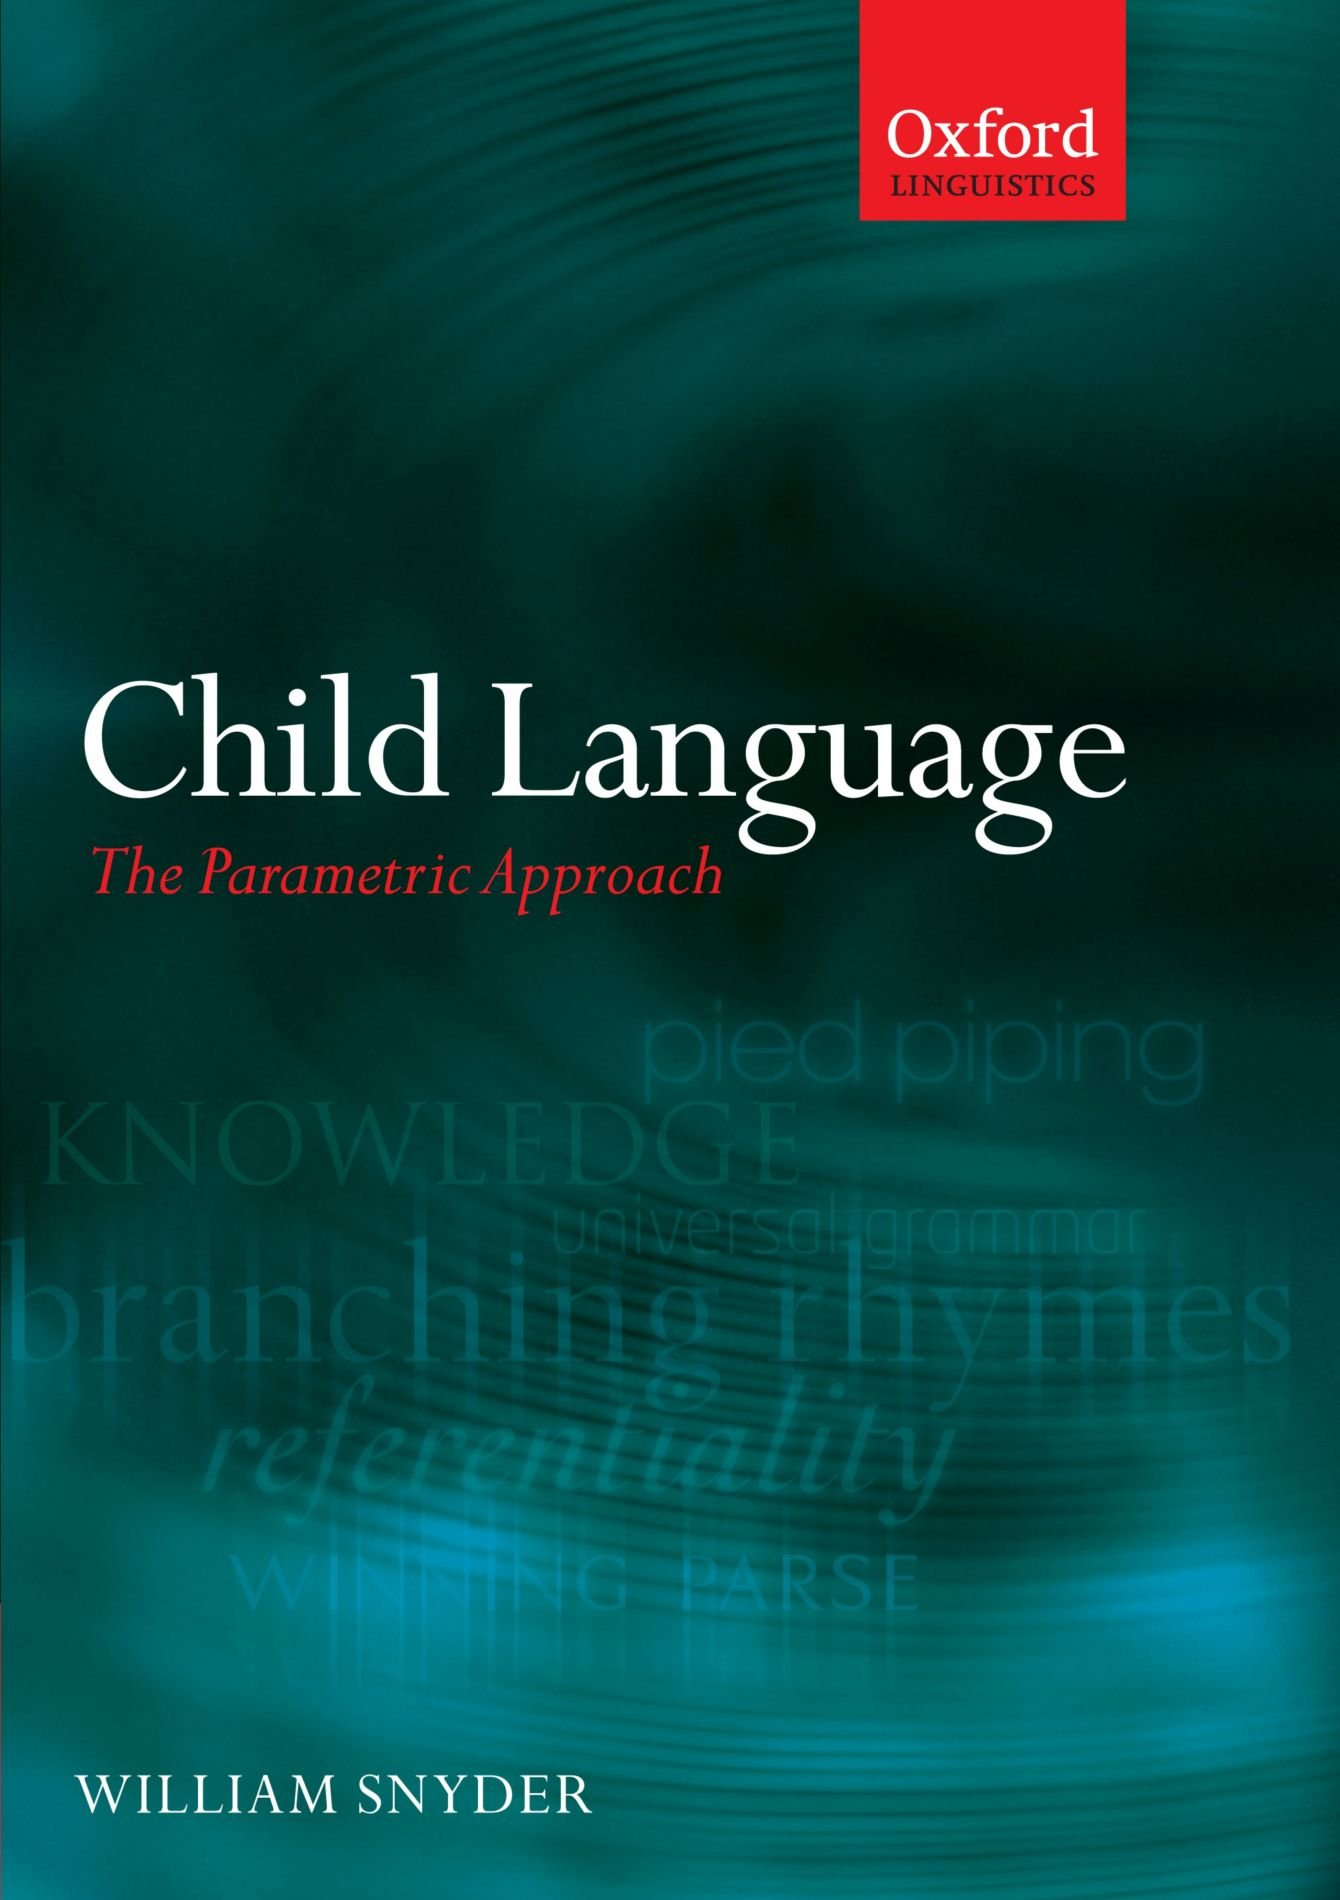 Child Language: The Parametric Approach (Oxford Linguistics)